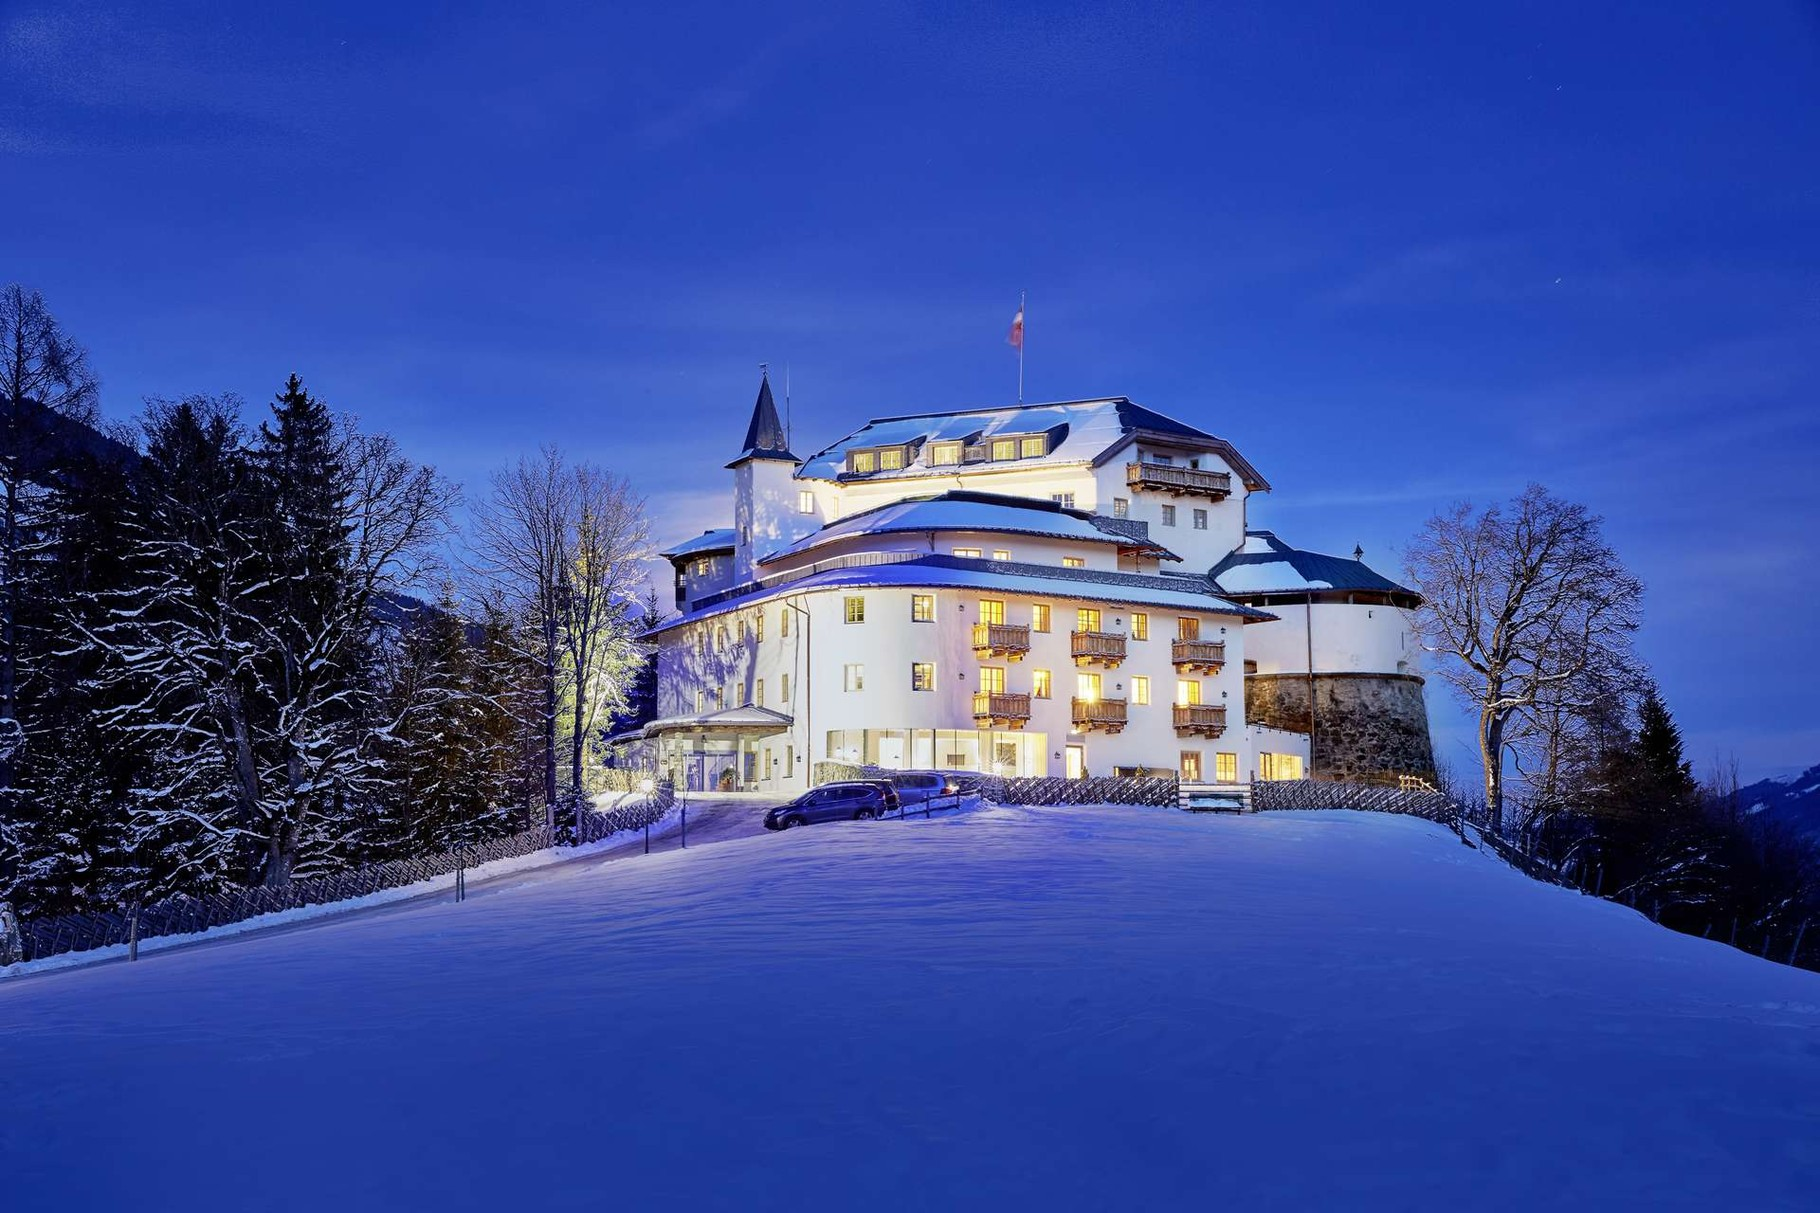 Schloss, Mittersill, Mittersill in Österreich